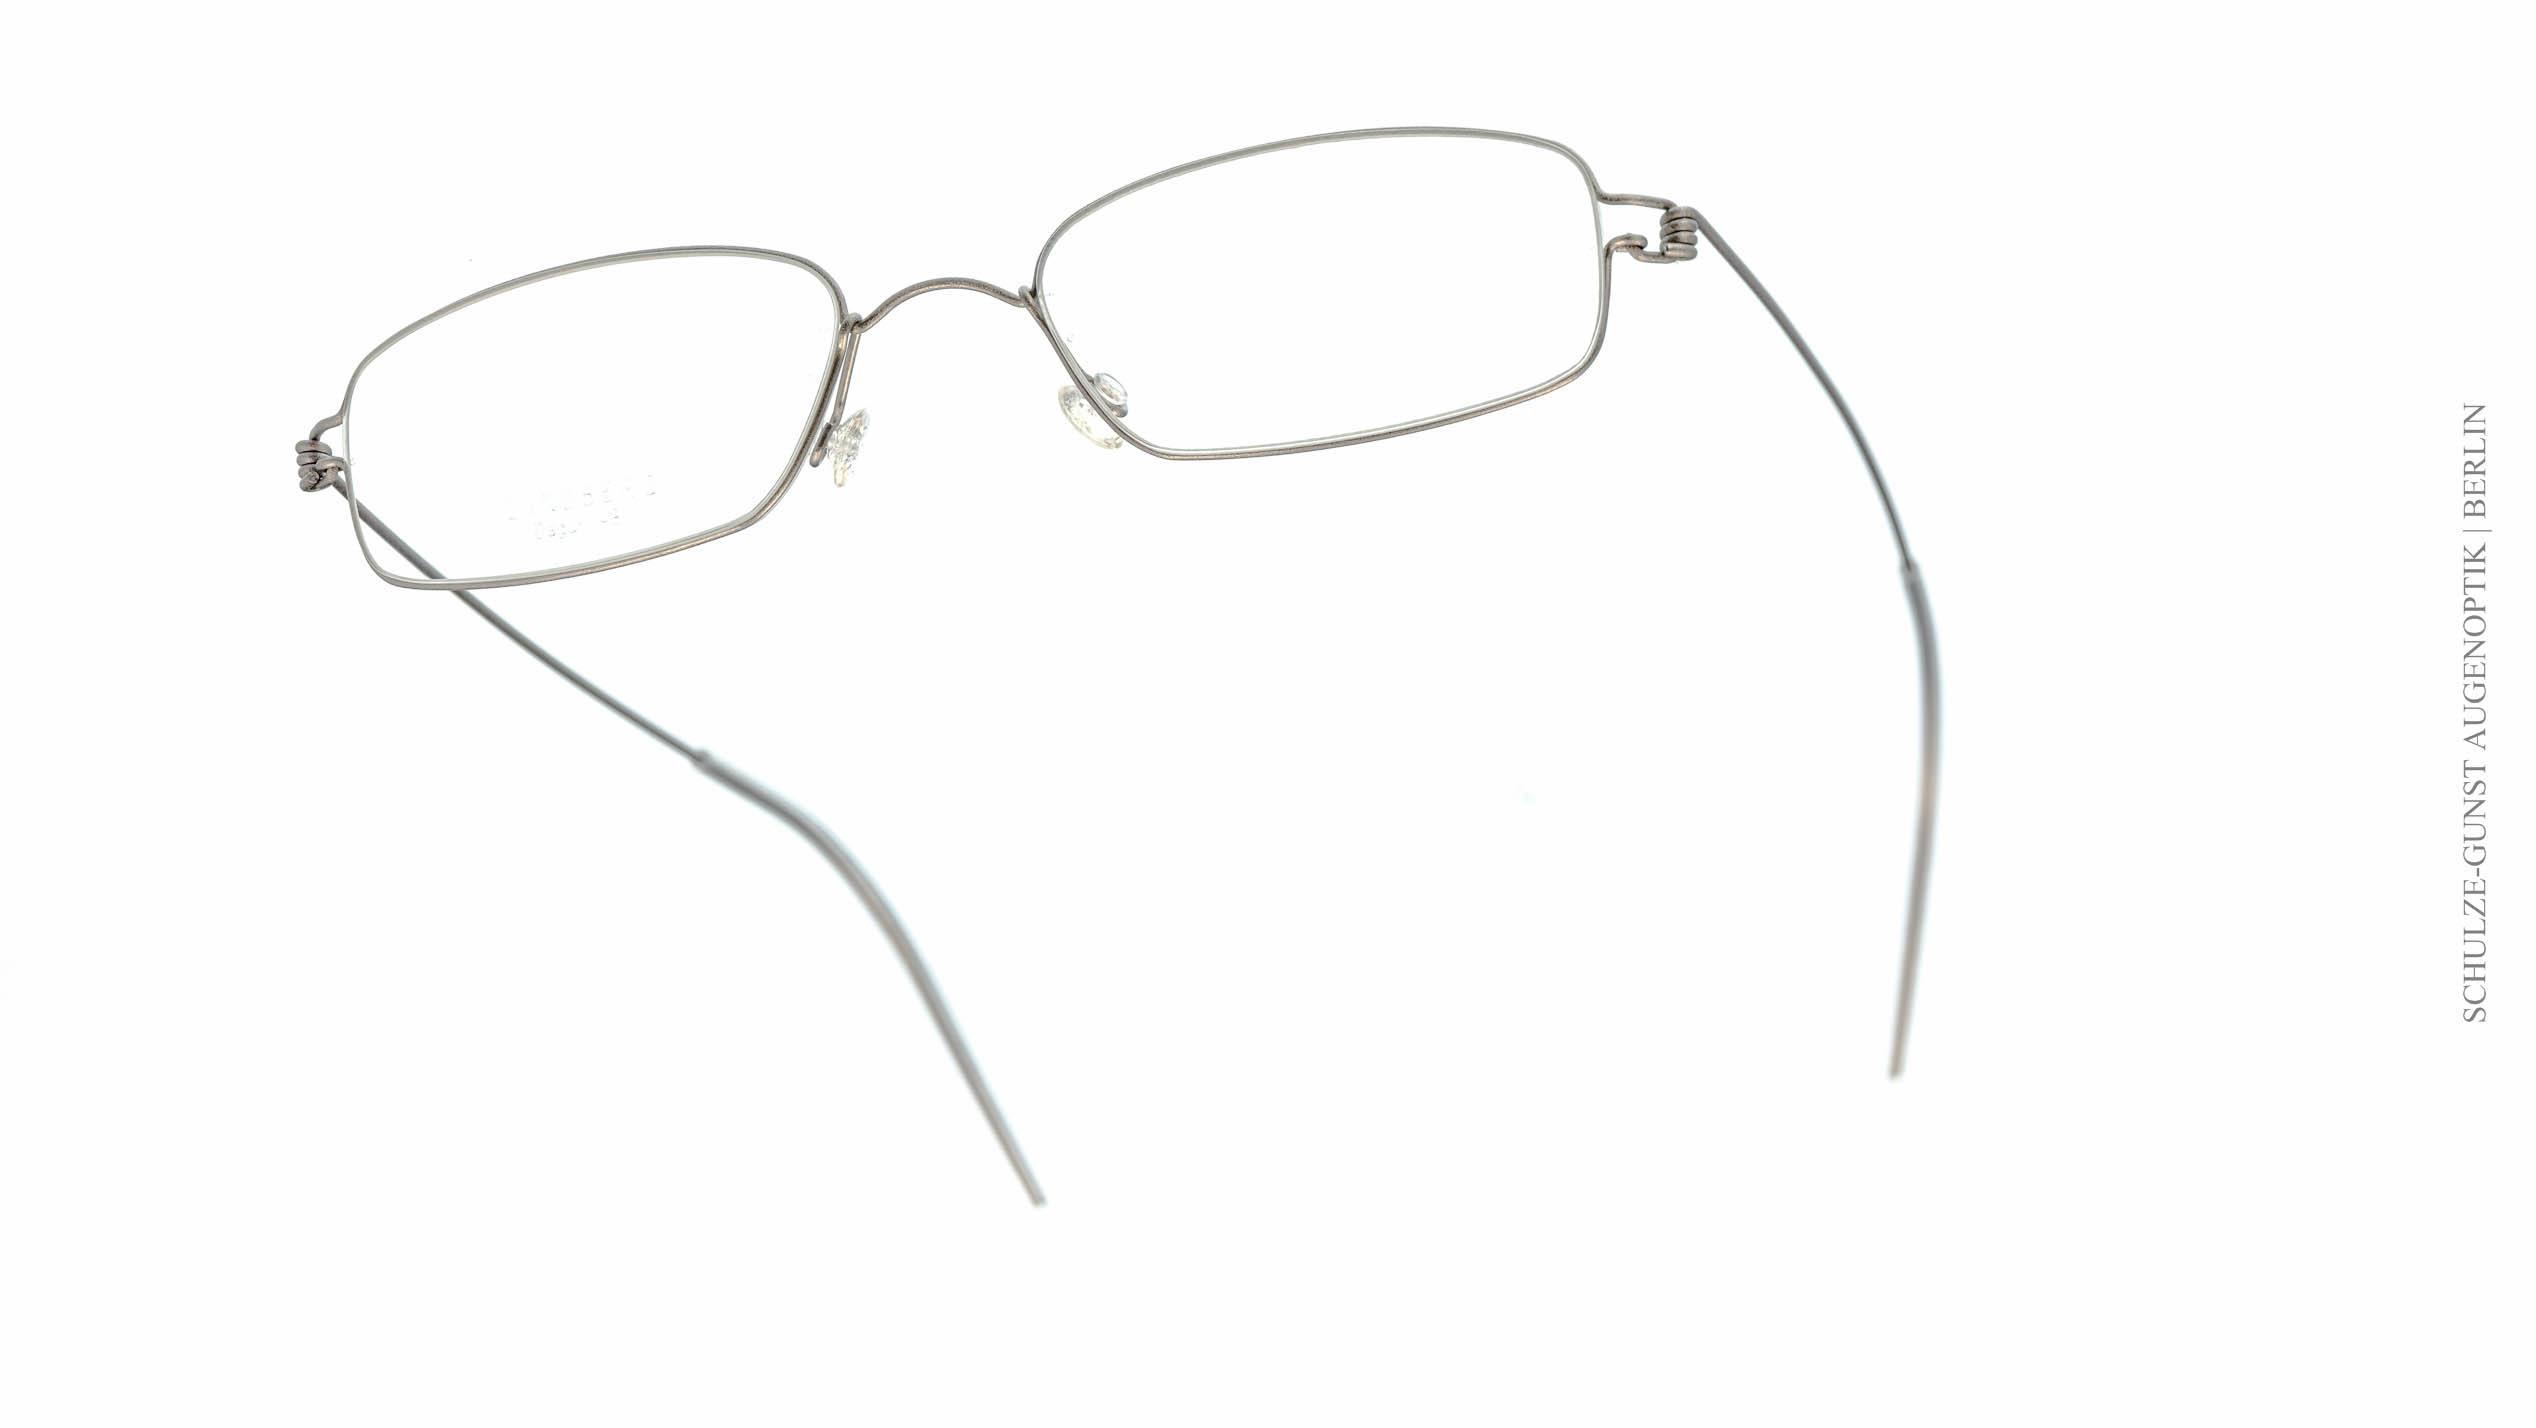 ddd5b5ac8a5 7733 – Lindberg   Air Titanium Rim - SCHULZE-GUNST Augenoptik seit 1894